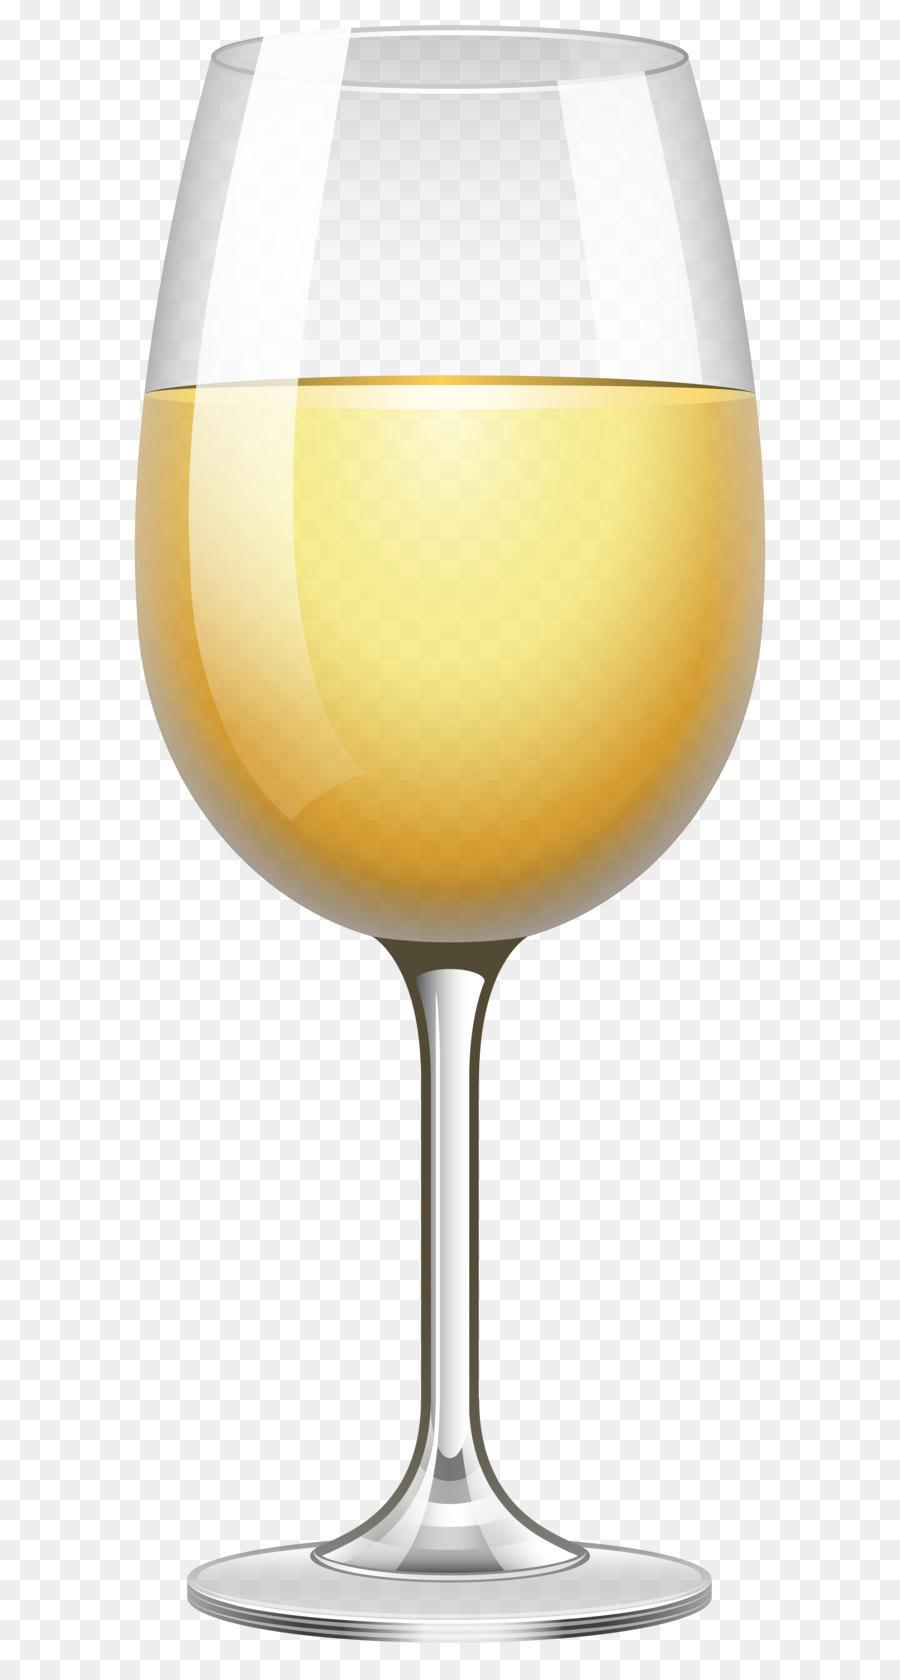 Descarga gratuita de Vino Tinto, Vino, Cóctel Imágen de Png